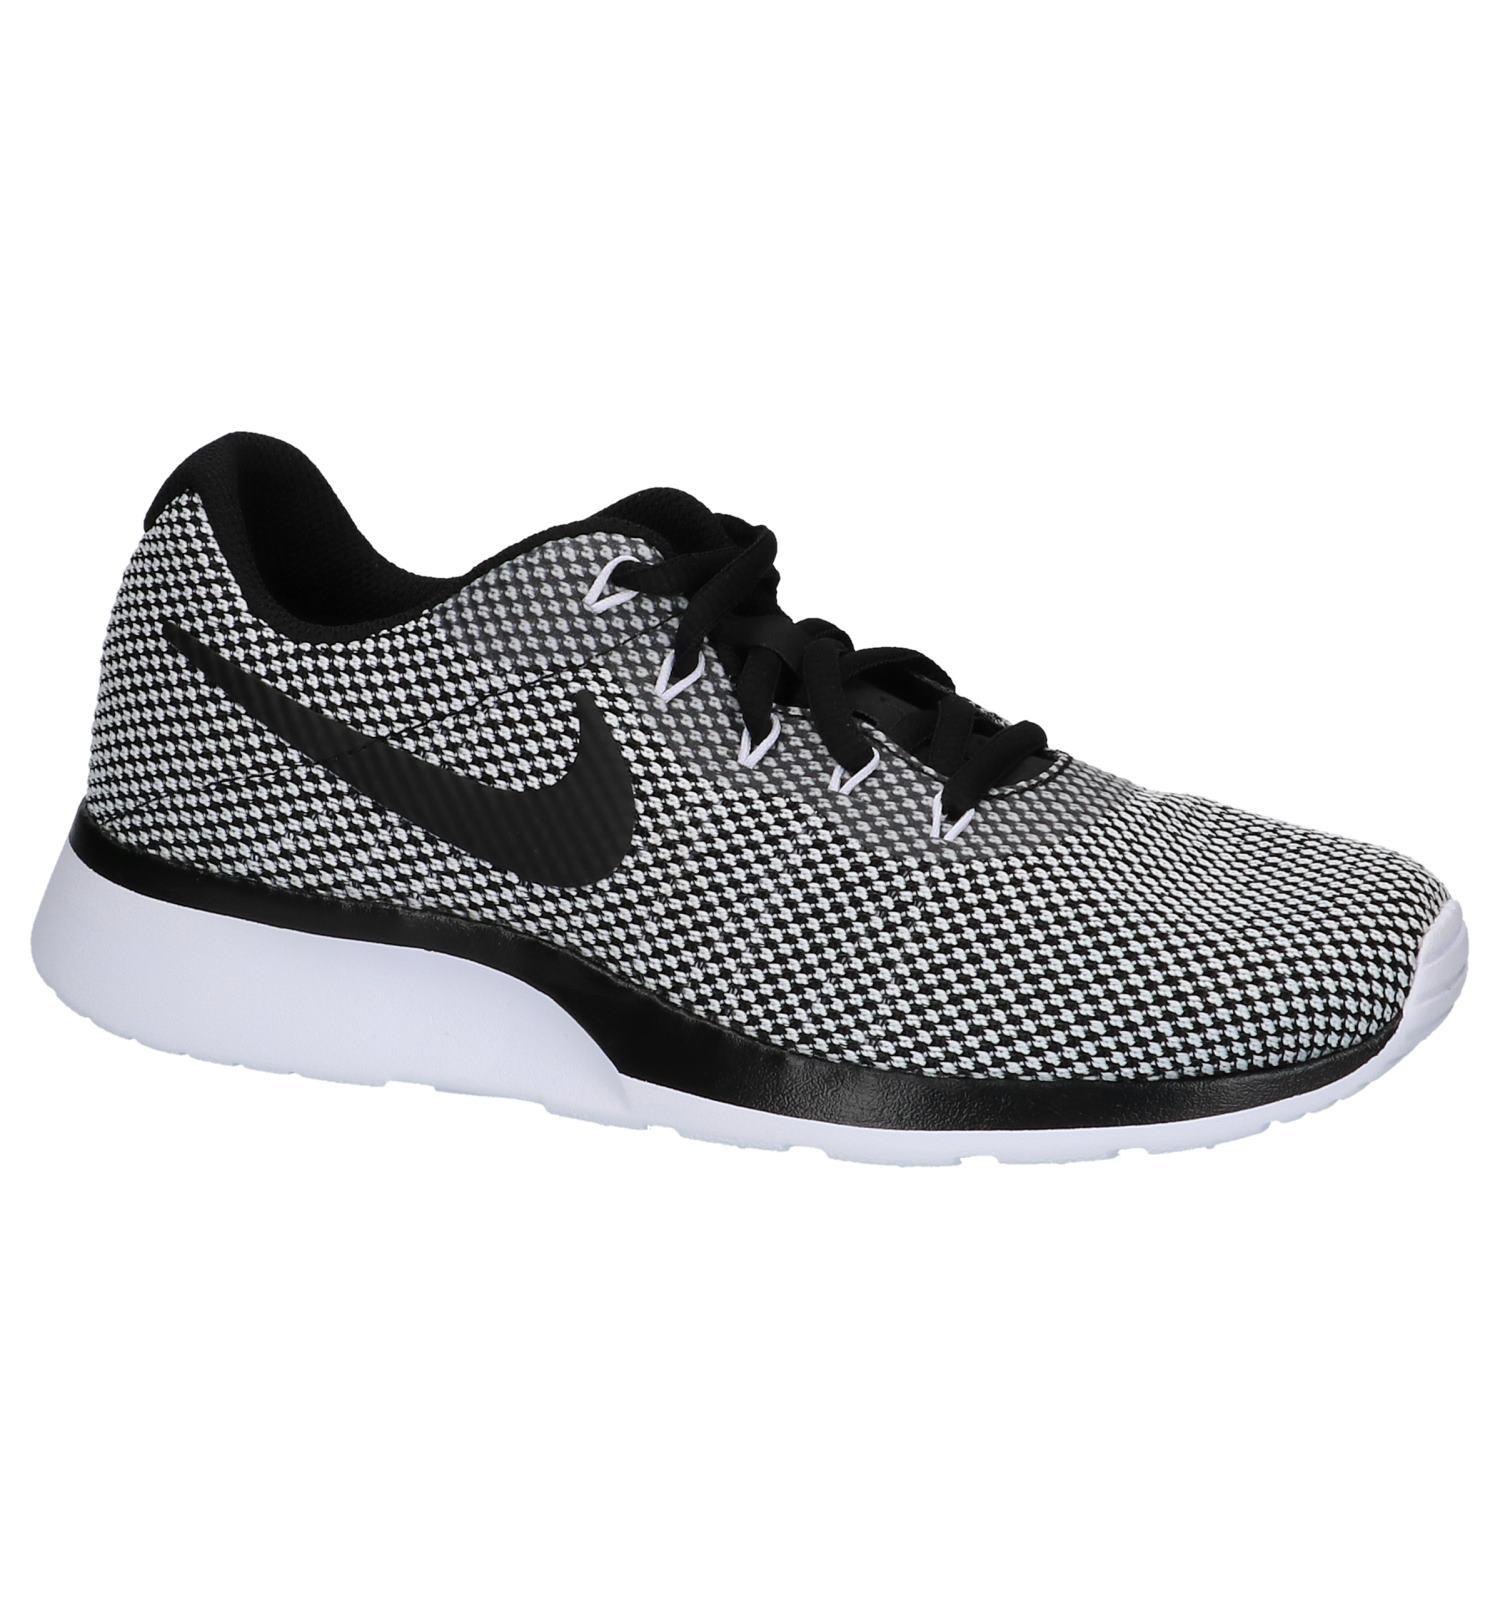 19aee7e3bef Zwarte Nike Tanjun Racer Sneakers   TORFS.BE   Gratis verzend en retour